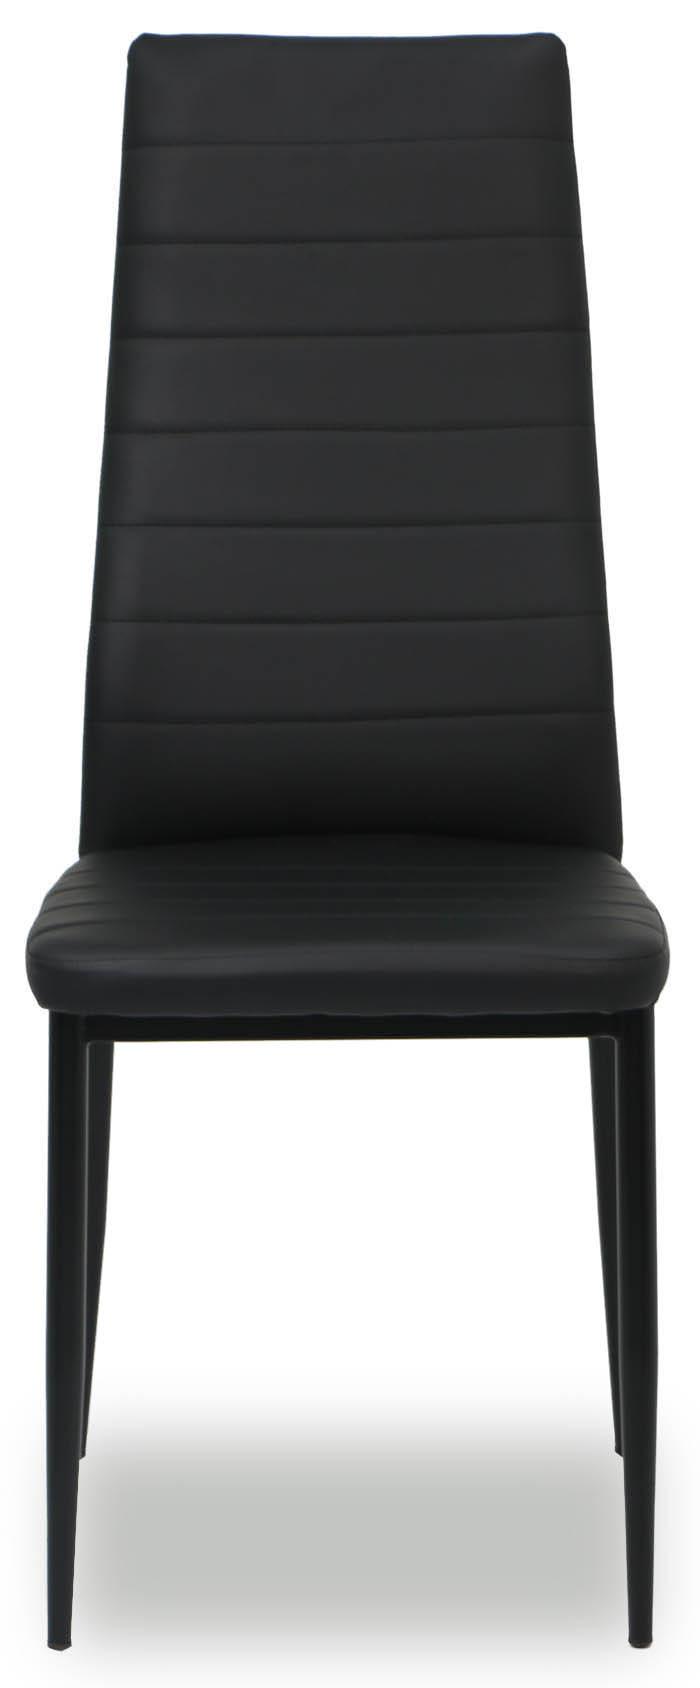 Quinn Dining Chair Black | Furniture & Home Décor | Fortytwo In Quinn Teak Sofa Chairs (View 4 of 25)